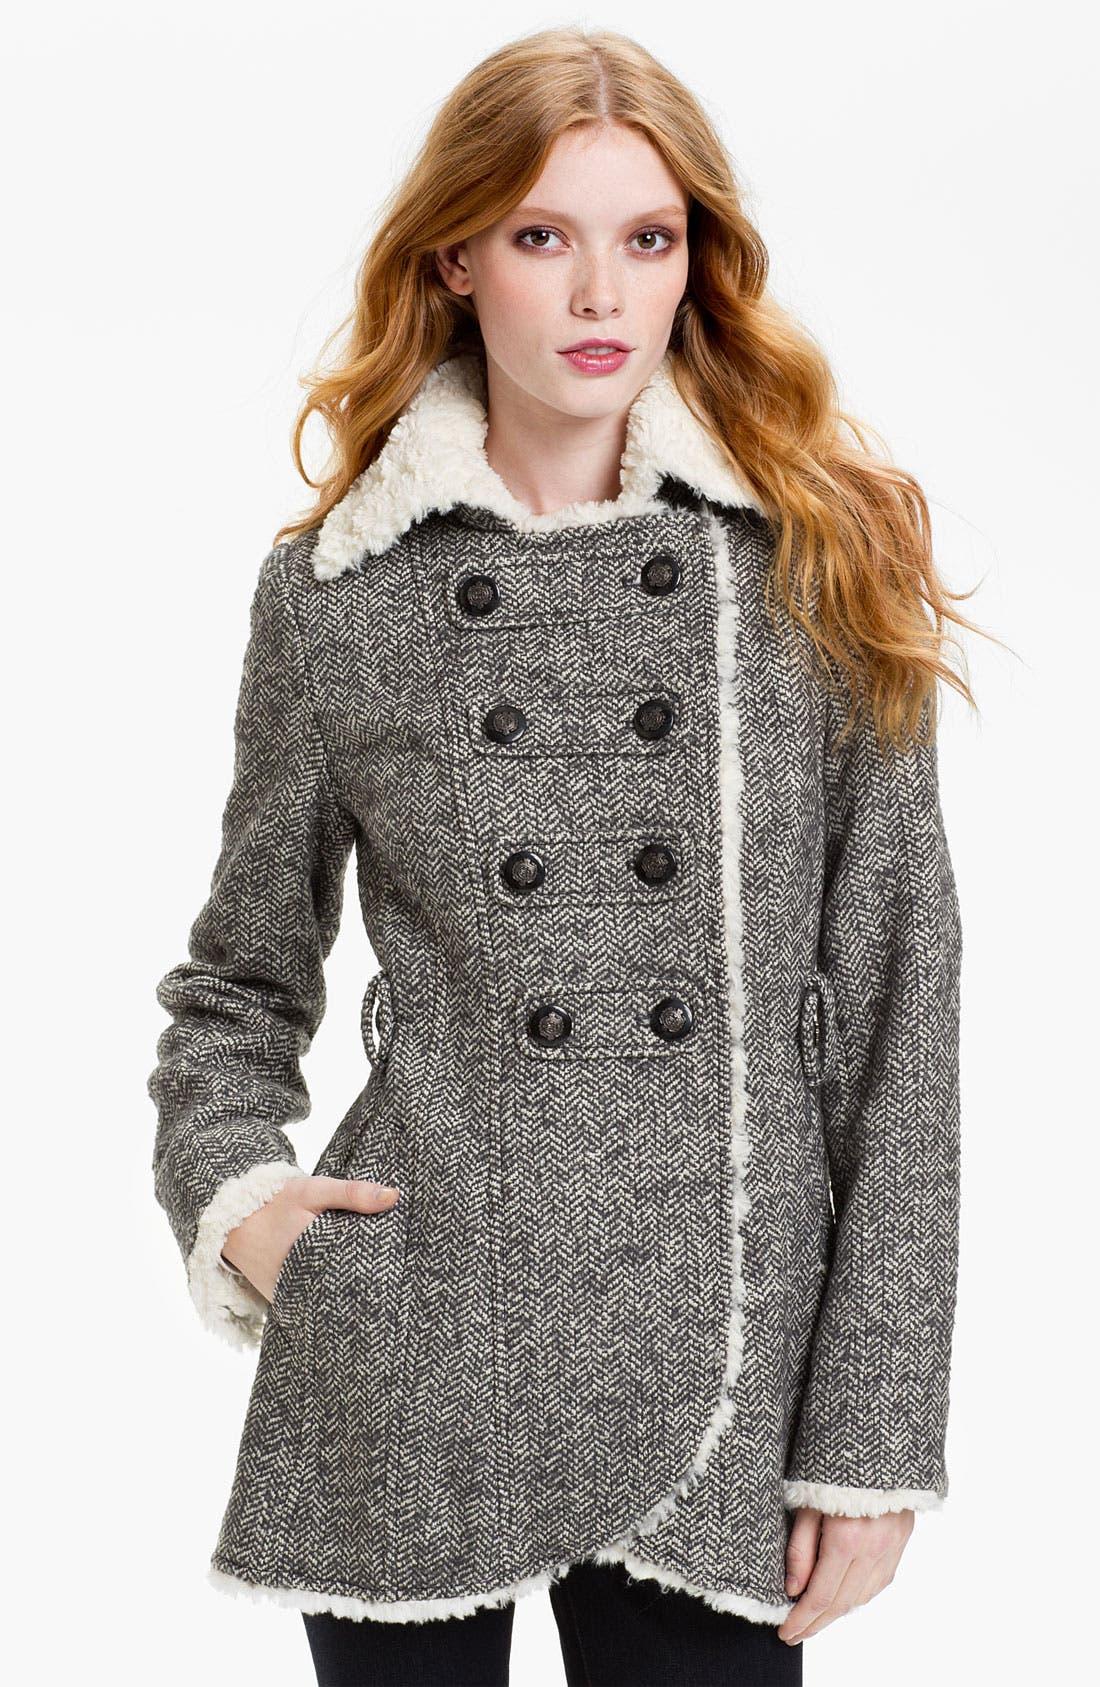 Alternate Image 1 Selected - GUESS Faux Shearling Fur Trim Peacoat (Online Exclusive)